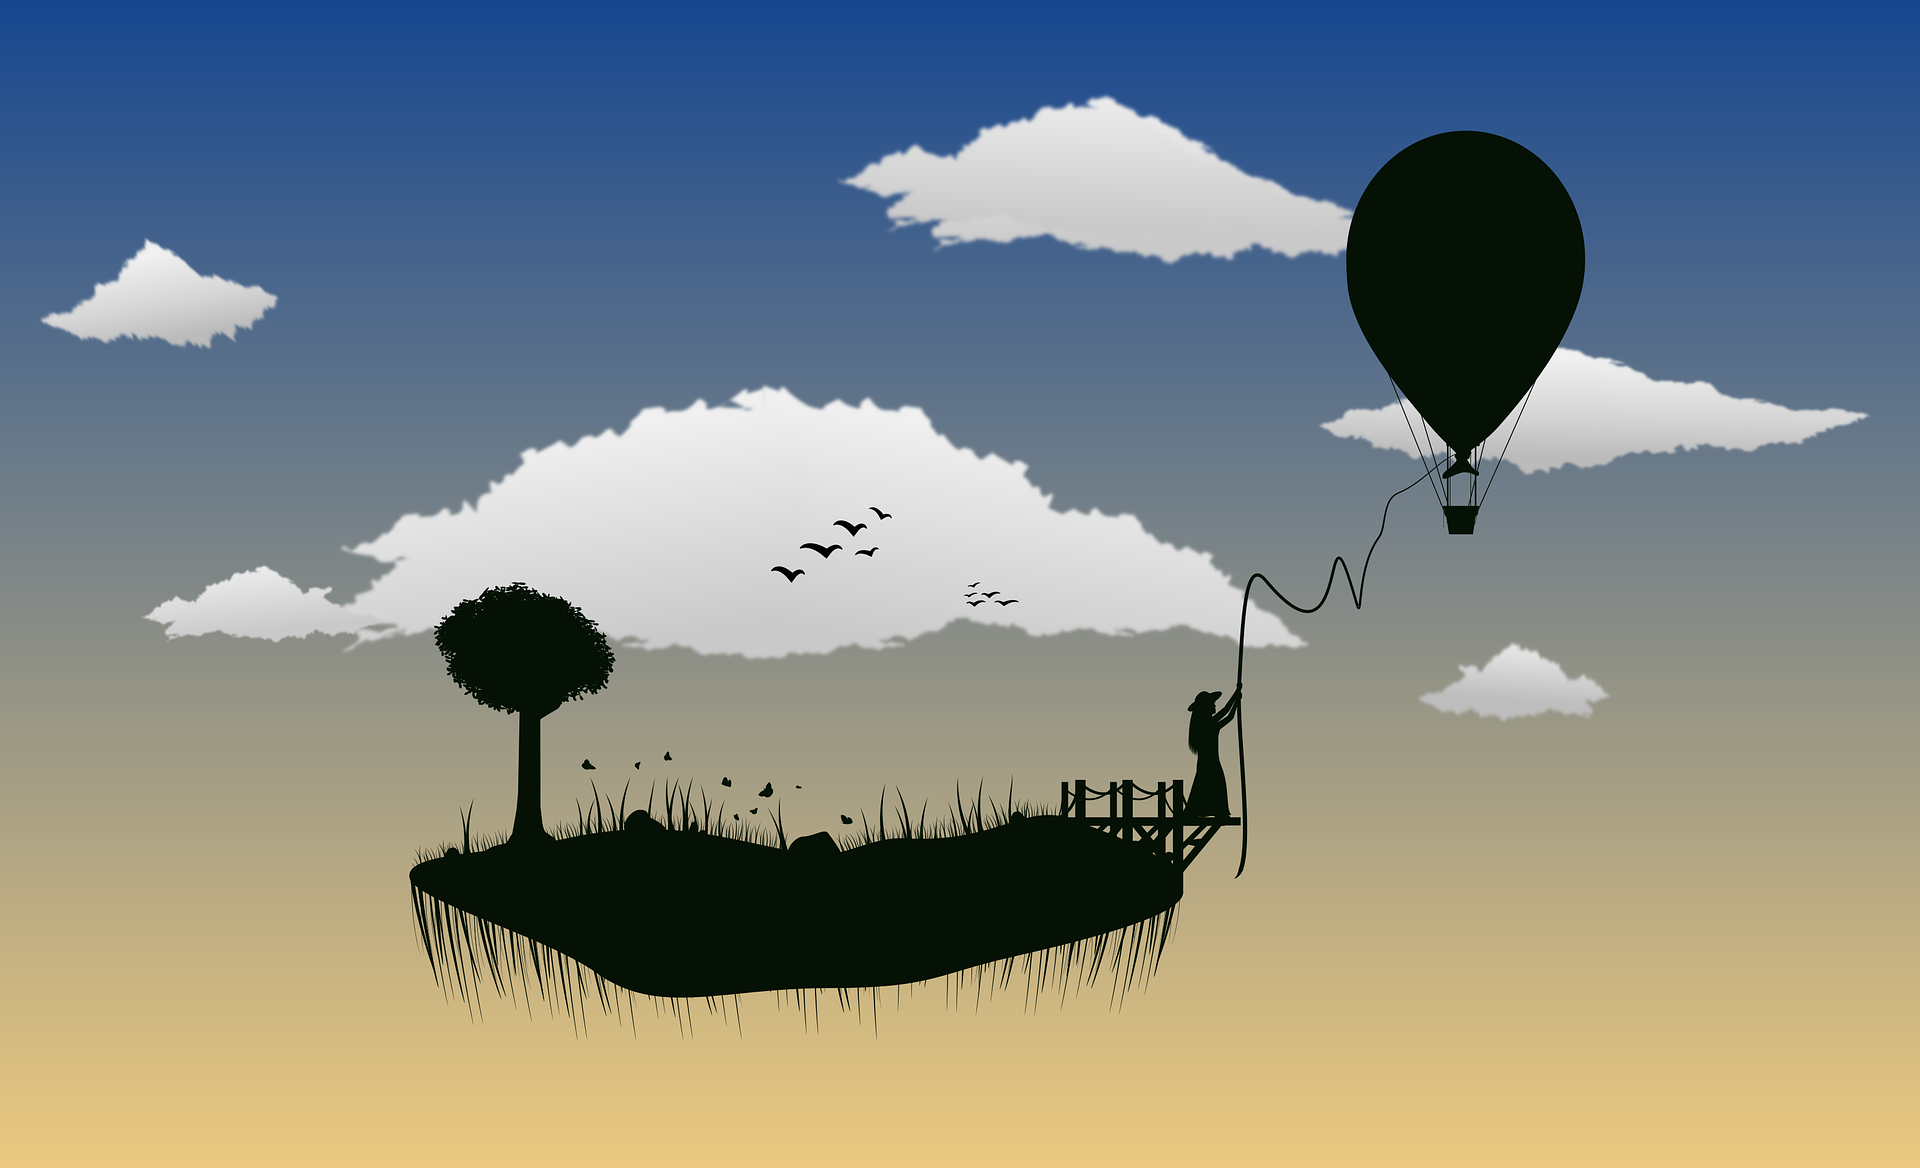 Cielo, nuvole, Isola, árbol, Palloncino, Sagoma - Sfondi HD - Professor-falken.com